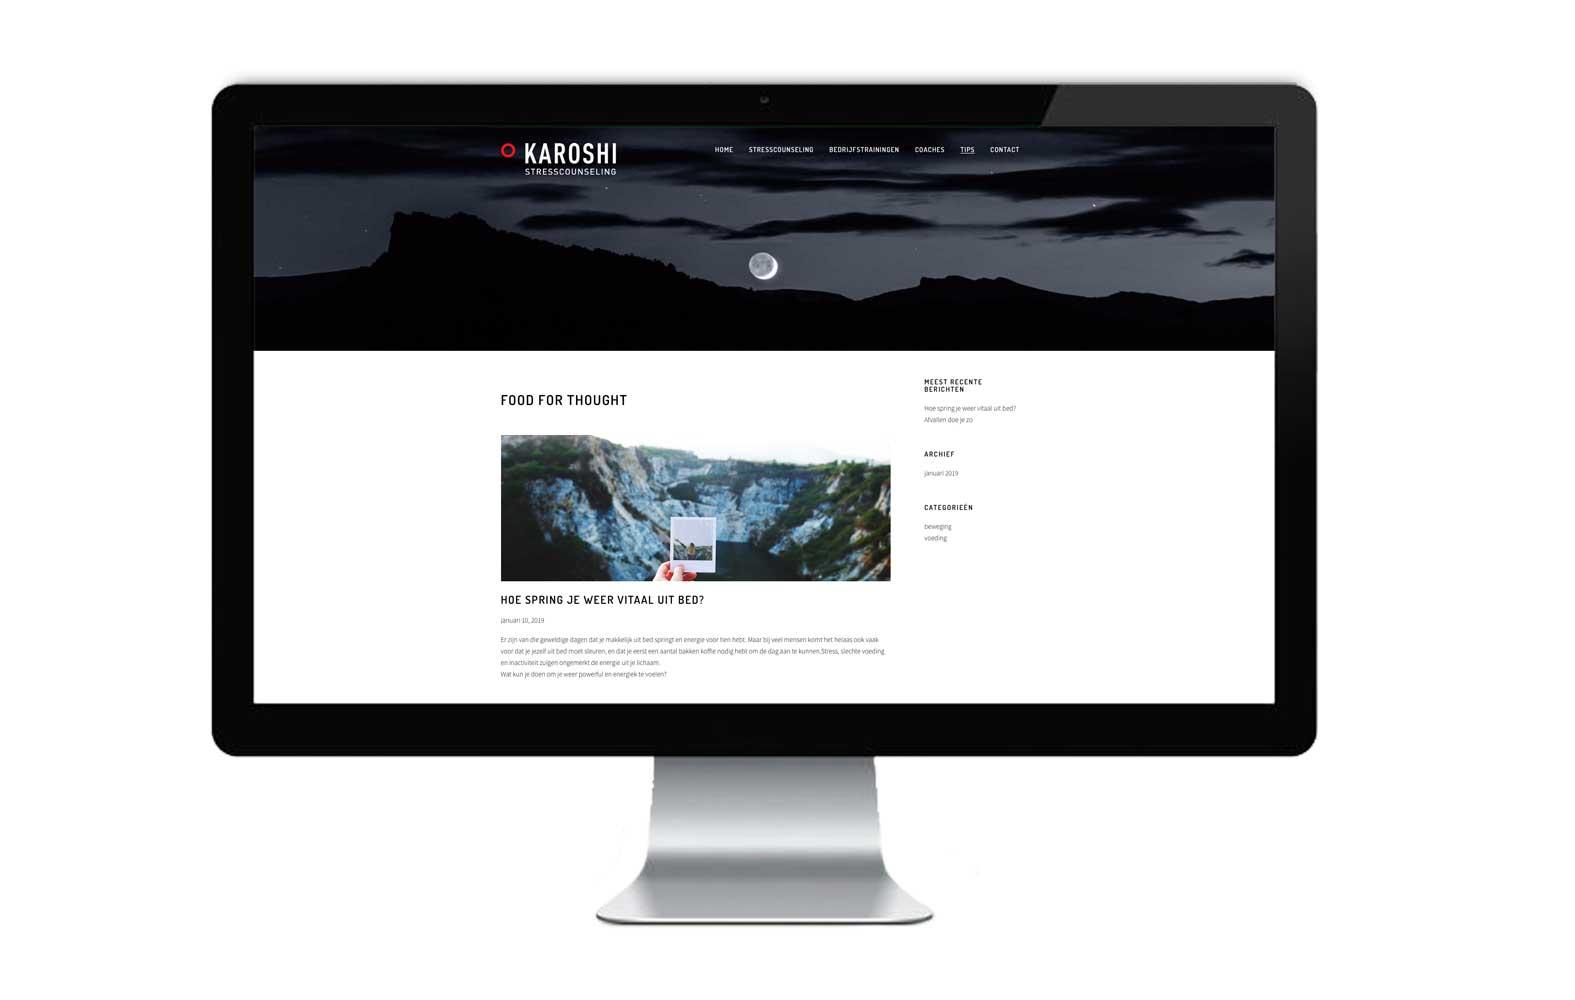 StudioErnst-WebDesign-Karoshi2